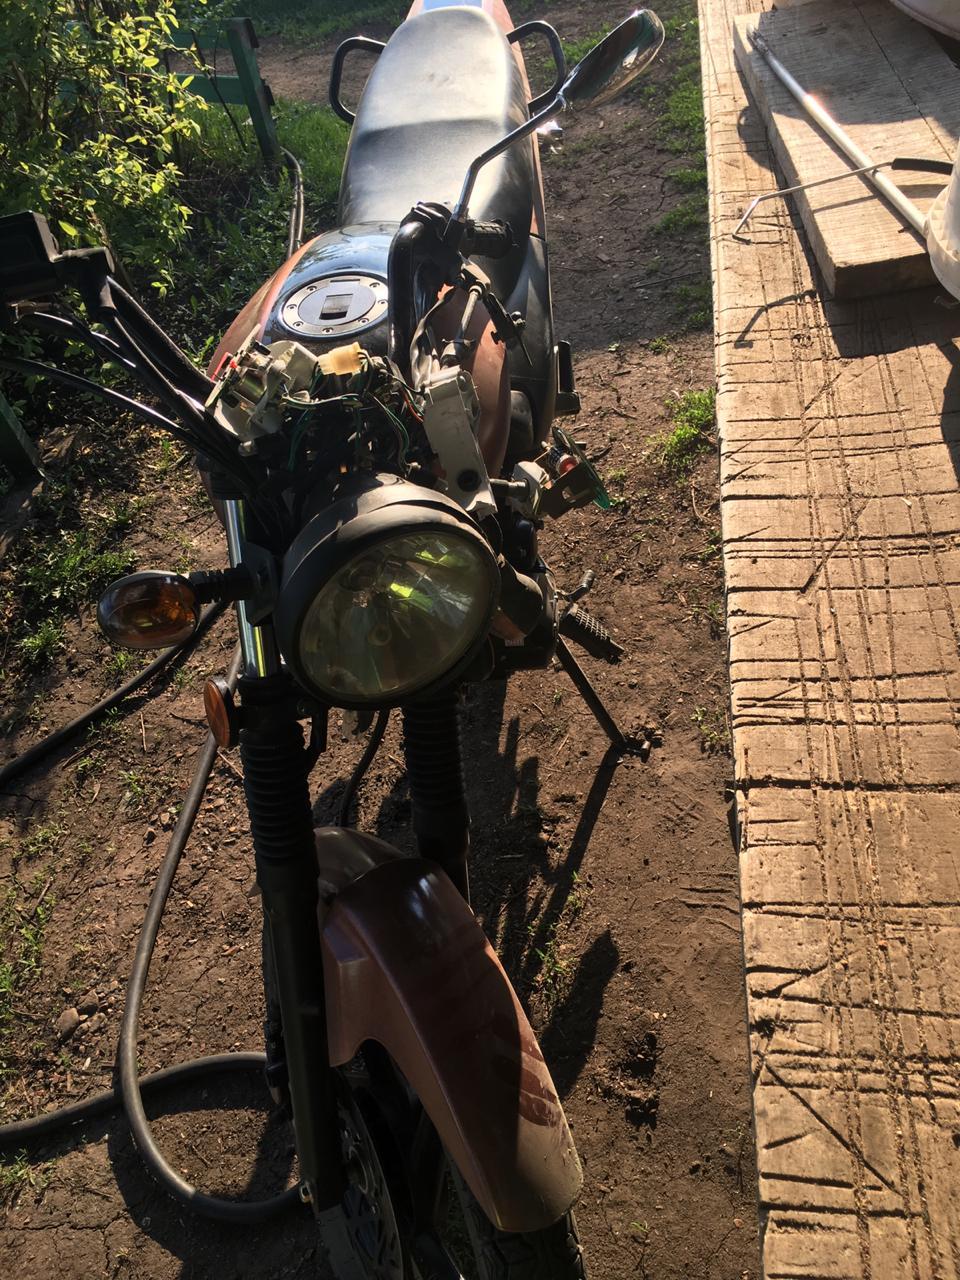 В Башкирии опрокинулся 13-летний мотоциклист